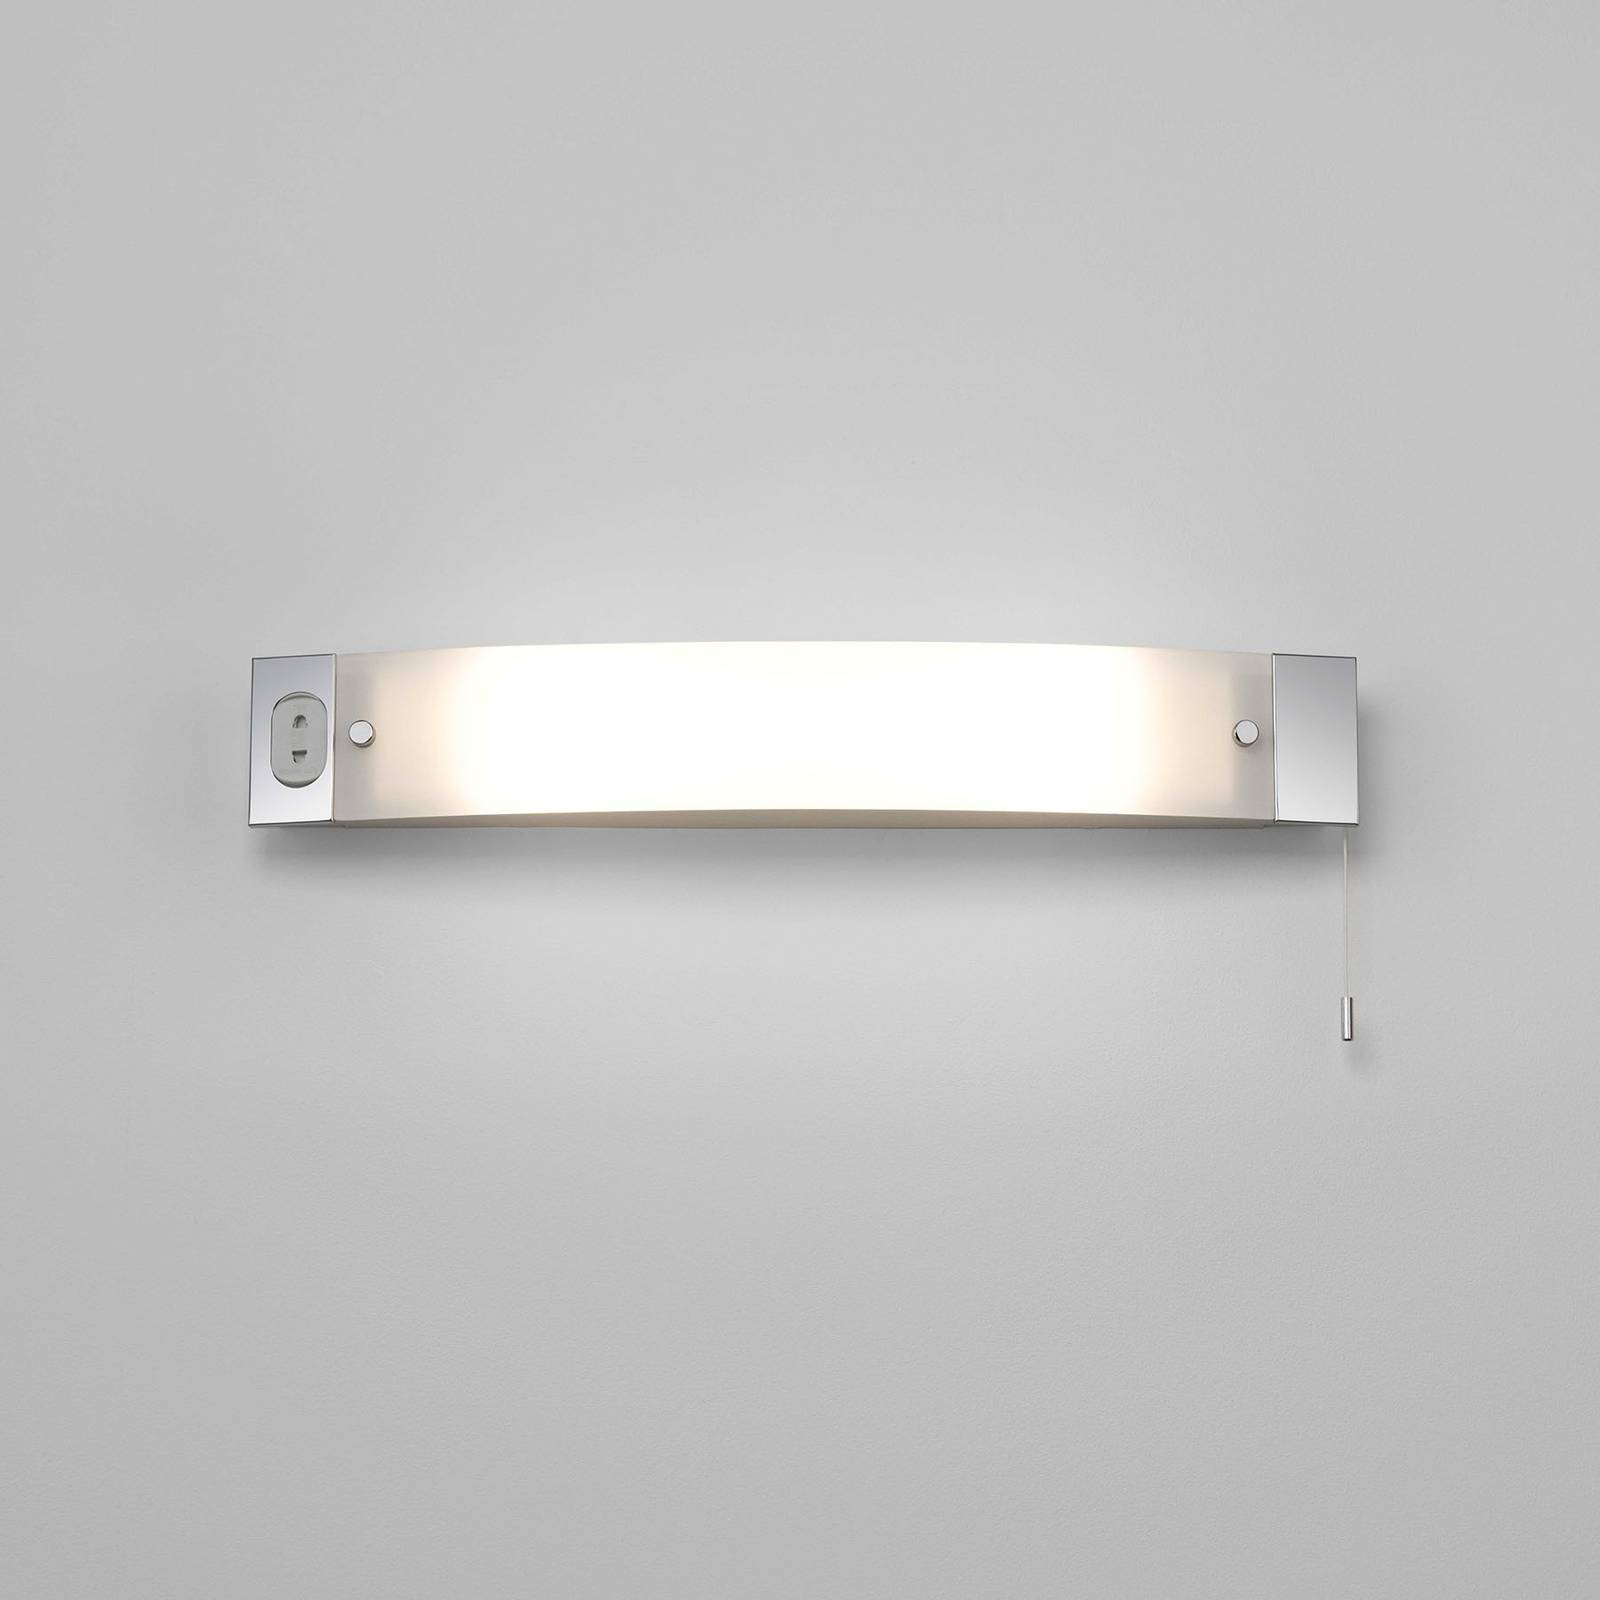 Astro Shaver Light -seinälamppu ja pistorasia